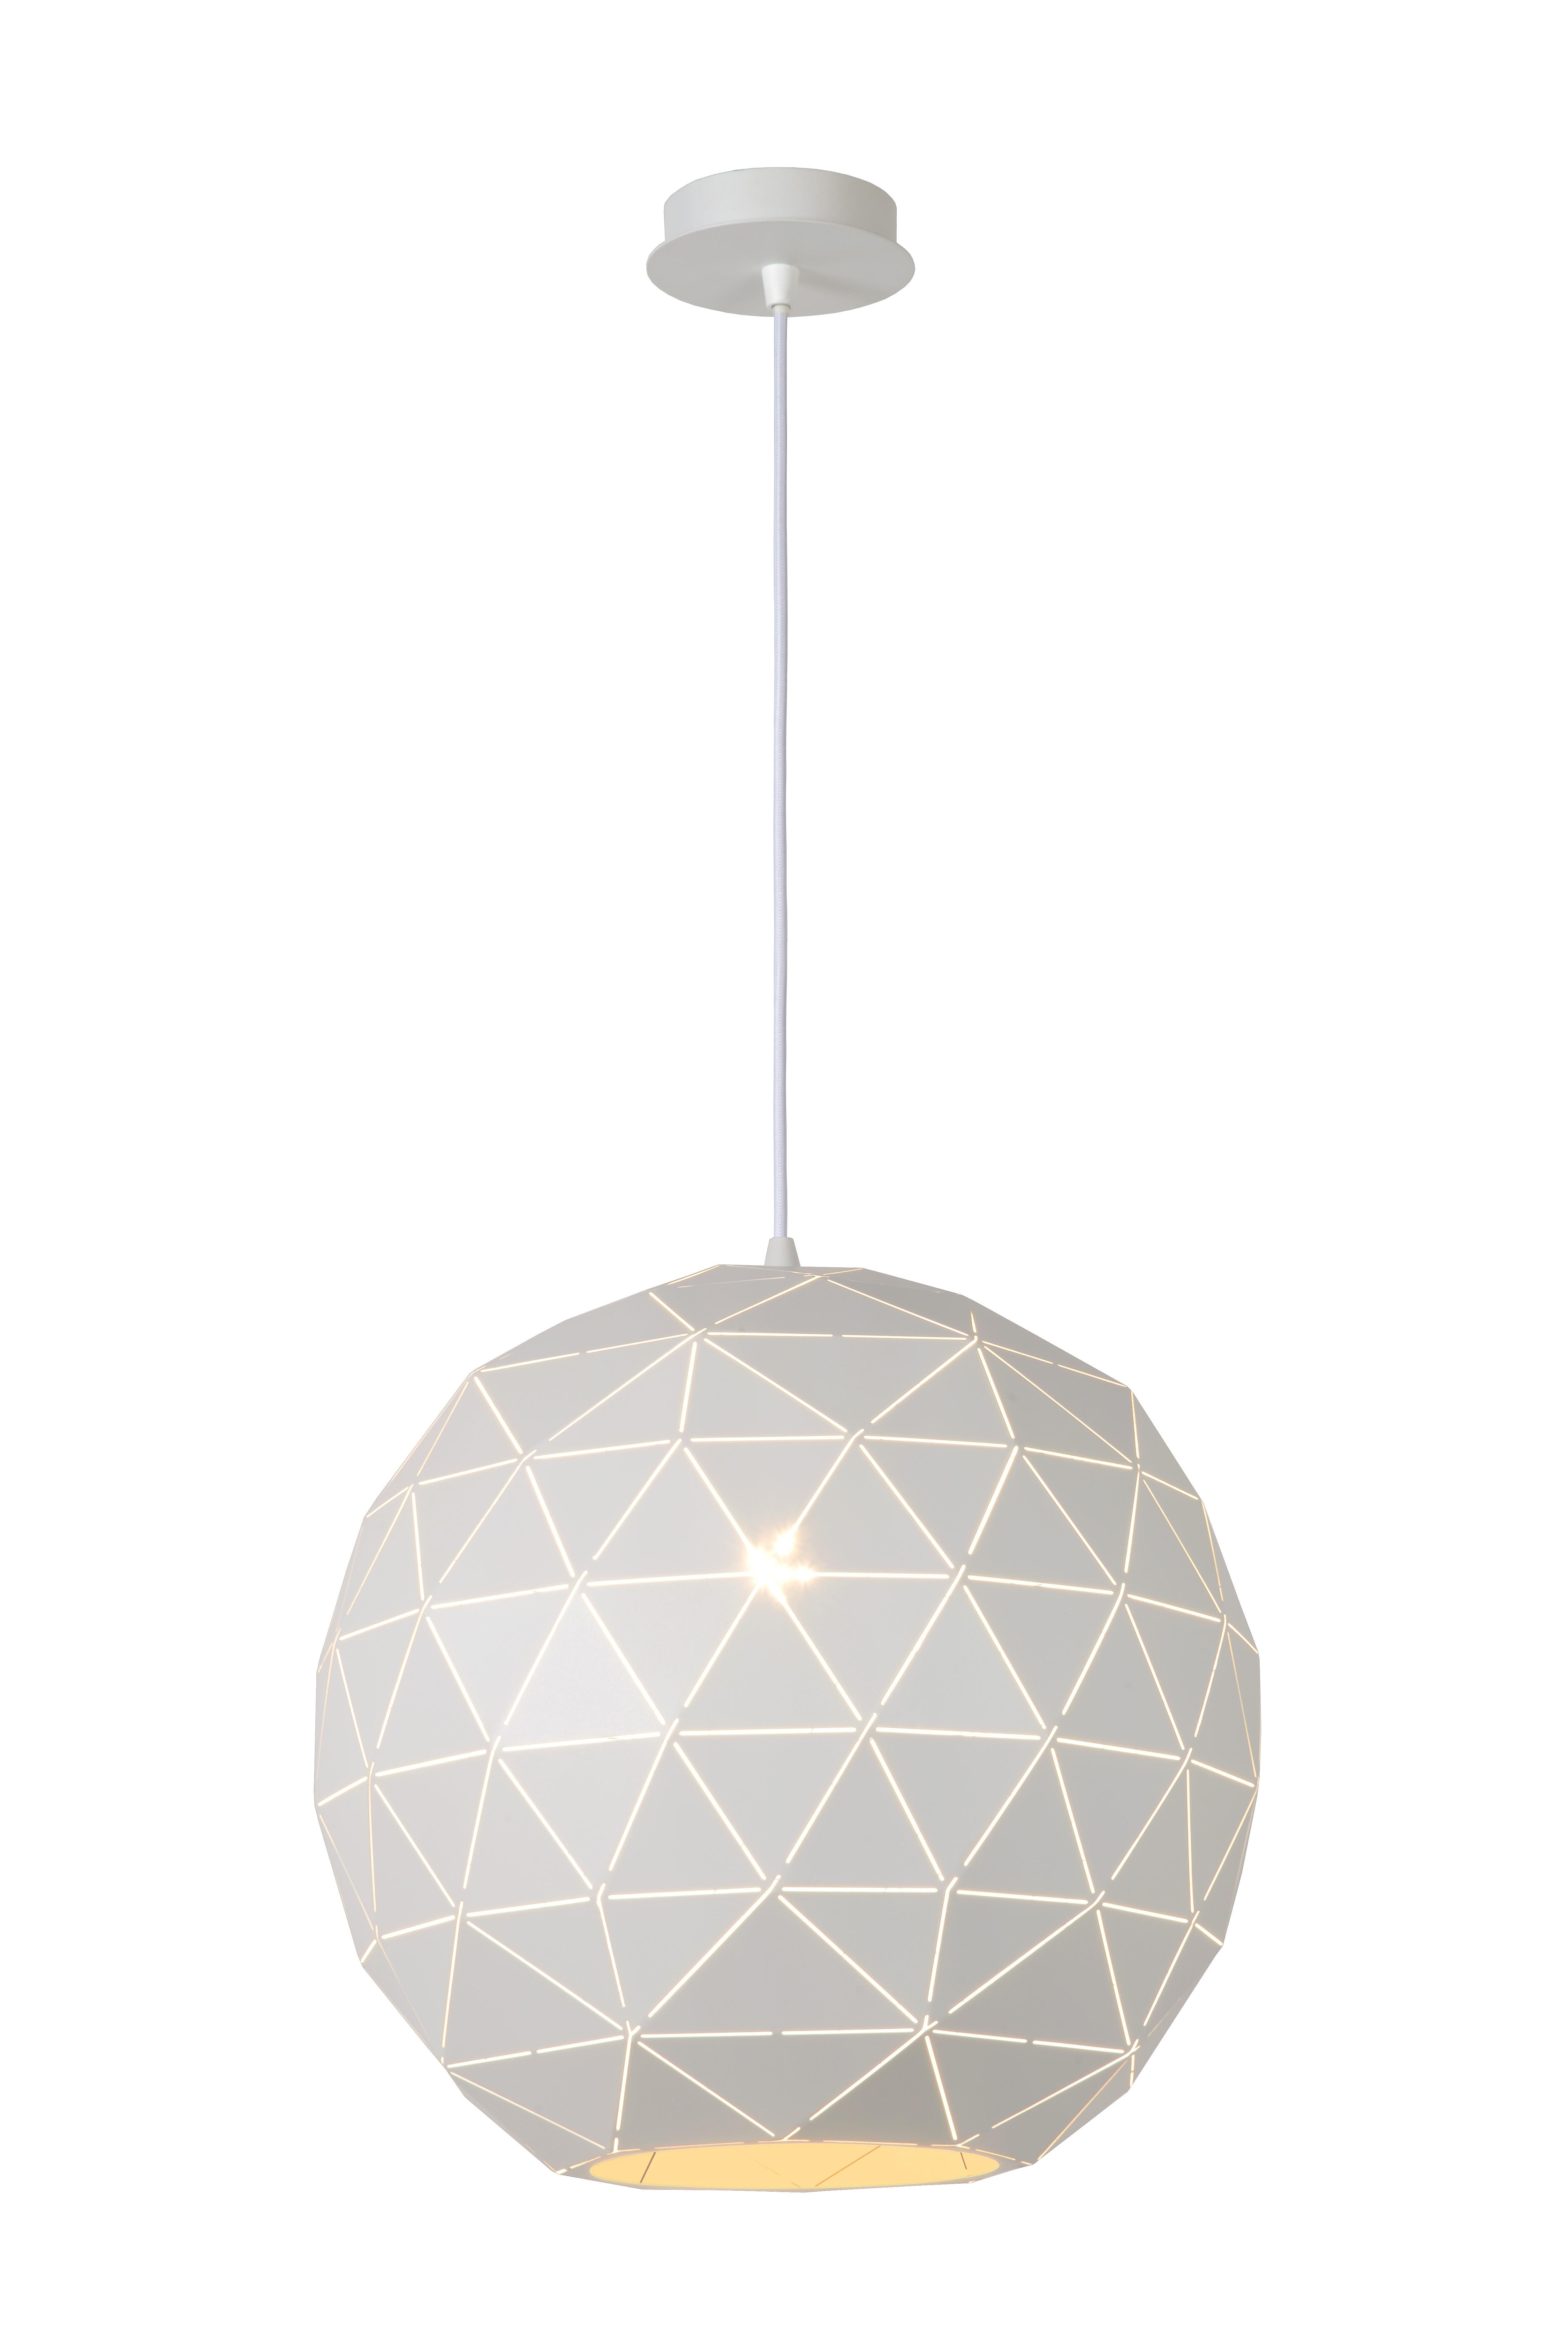 Otona hanglamp wit